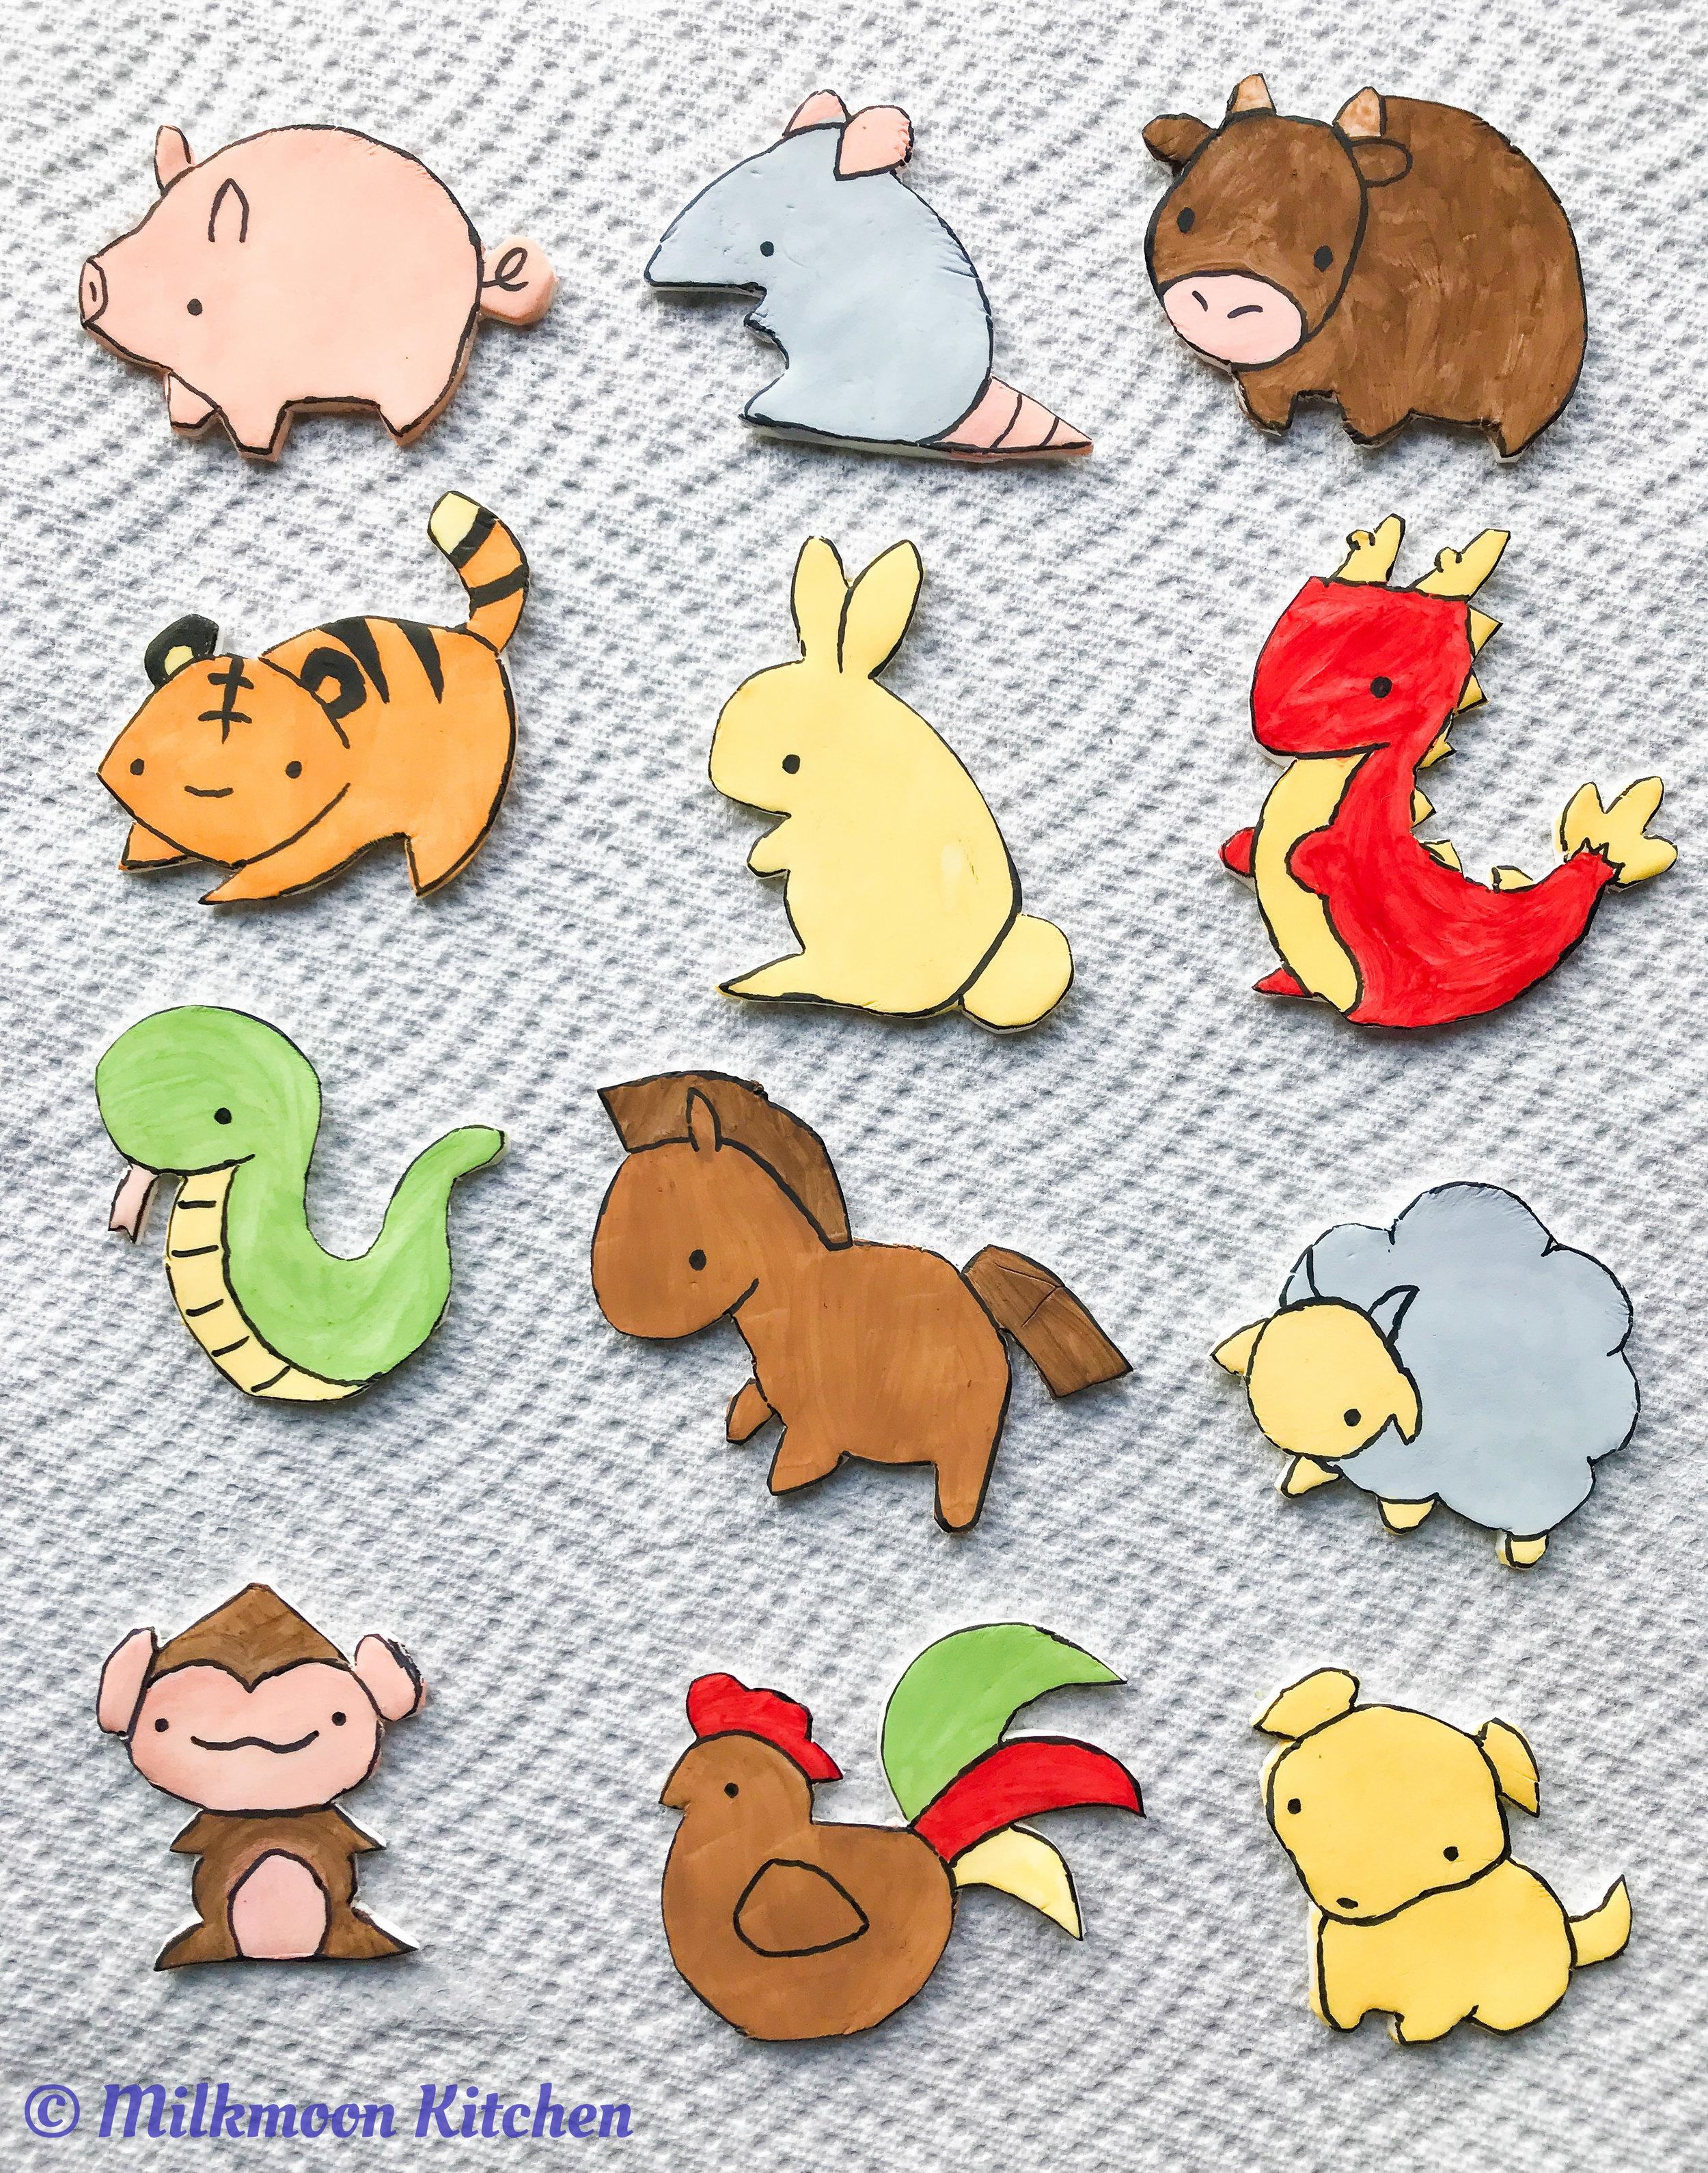 Chinese Zodiac Cupcakes